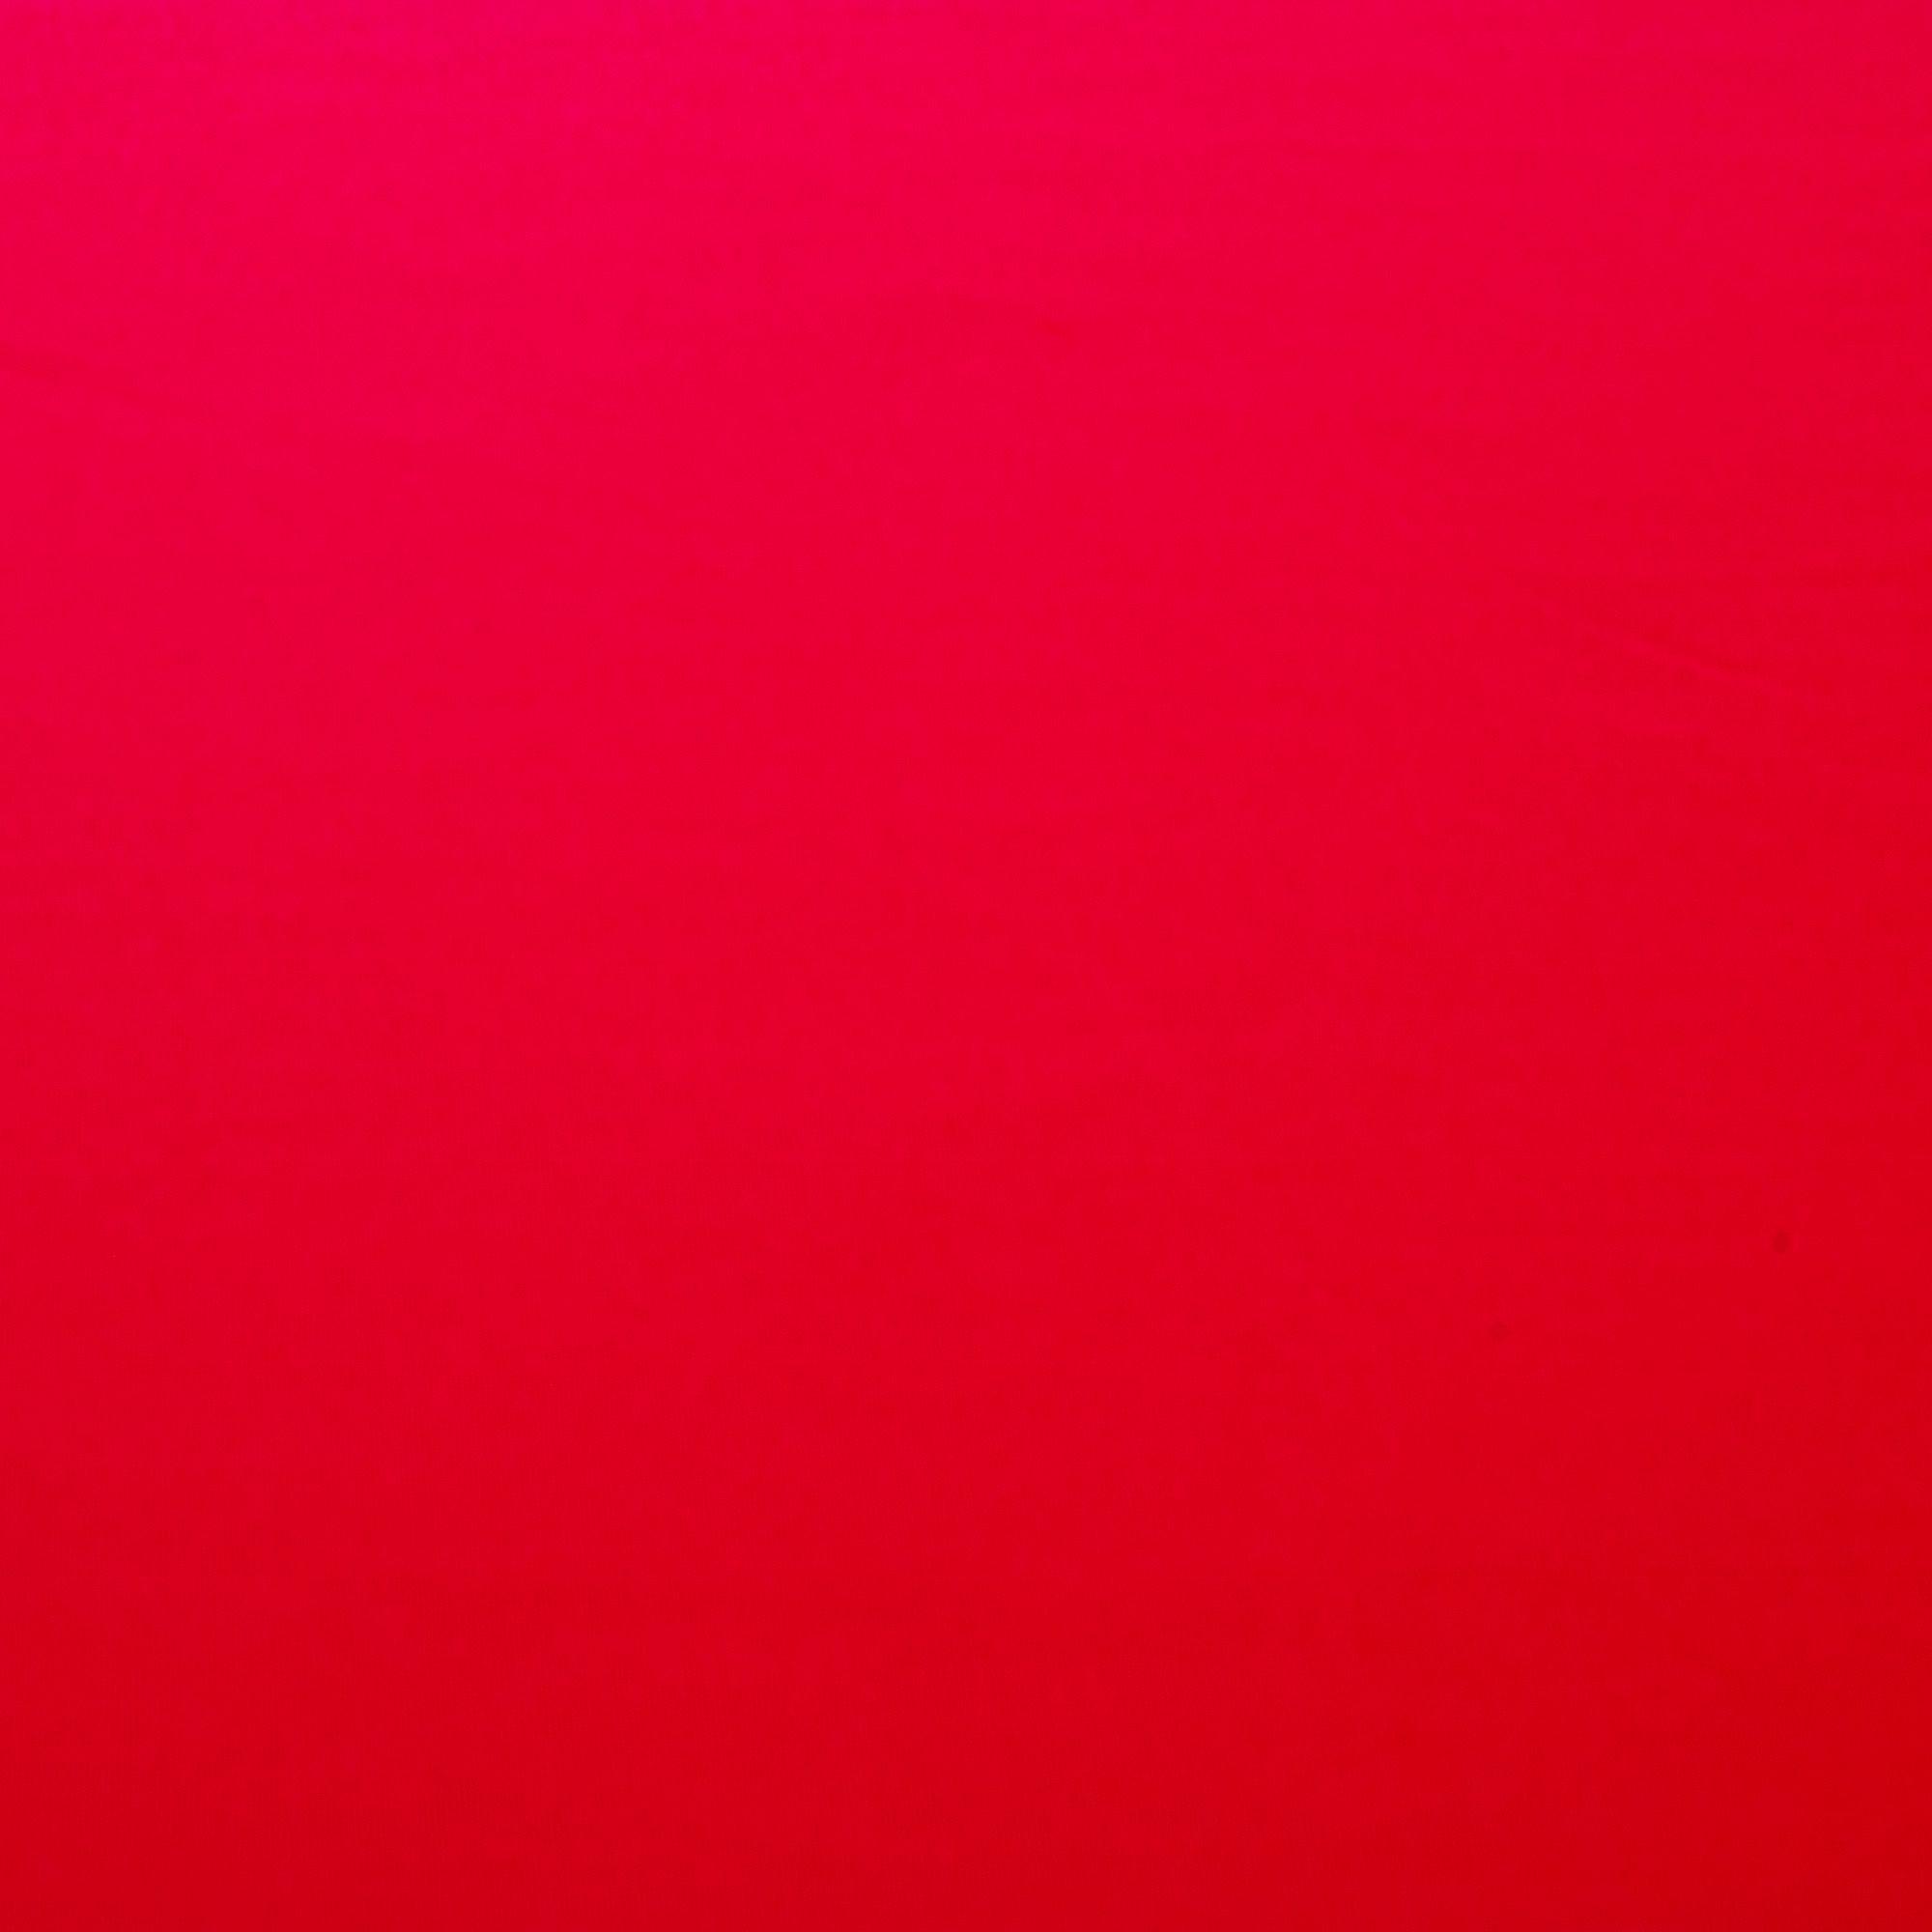 Tecido Malha Neoprene 95% Poliester 5% Elastano Vermelho